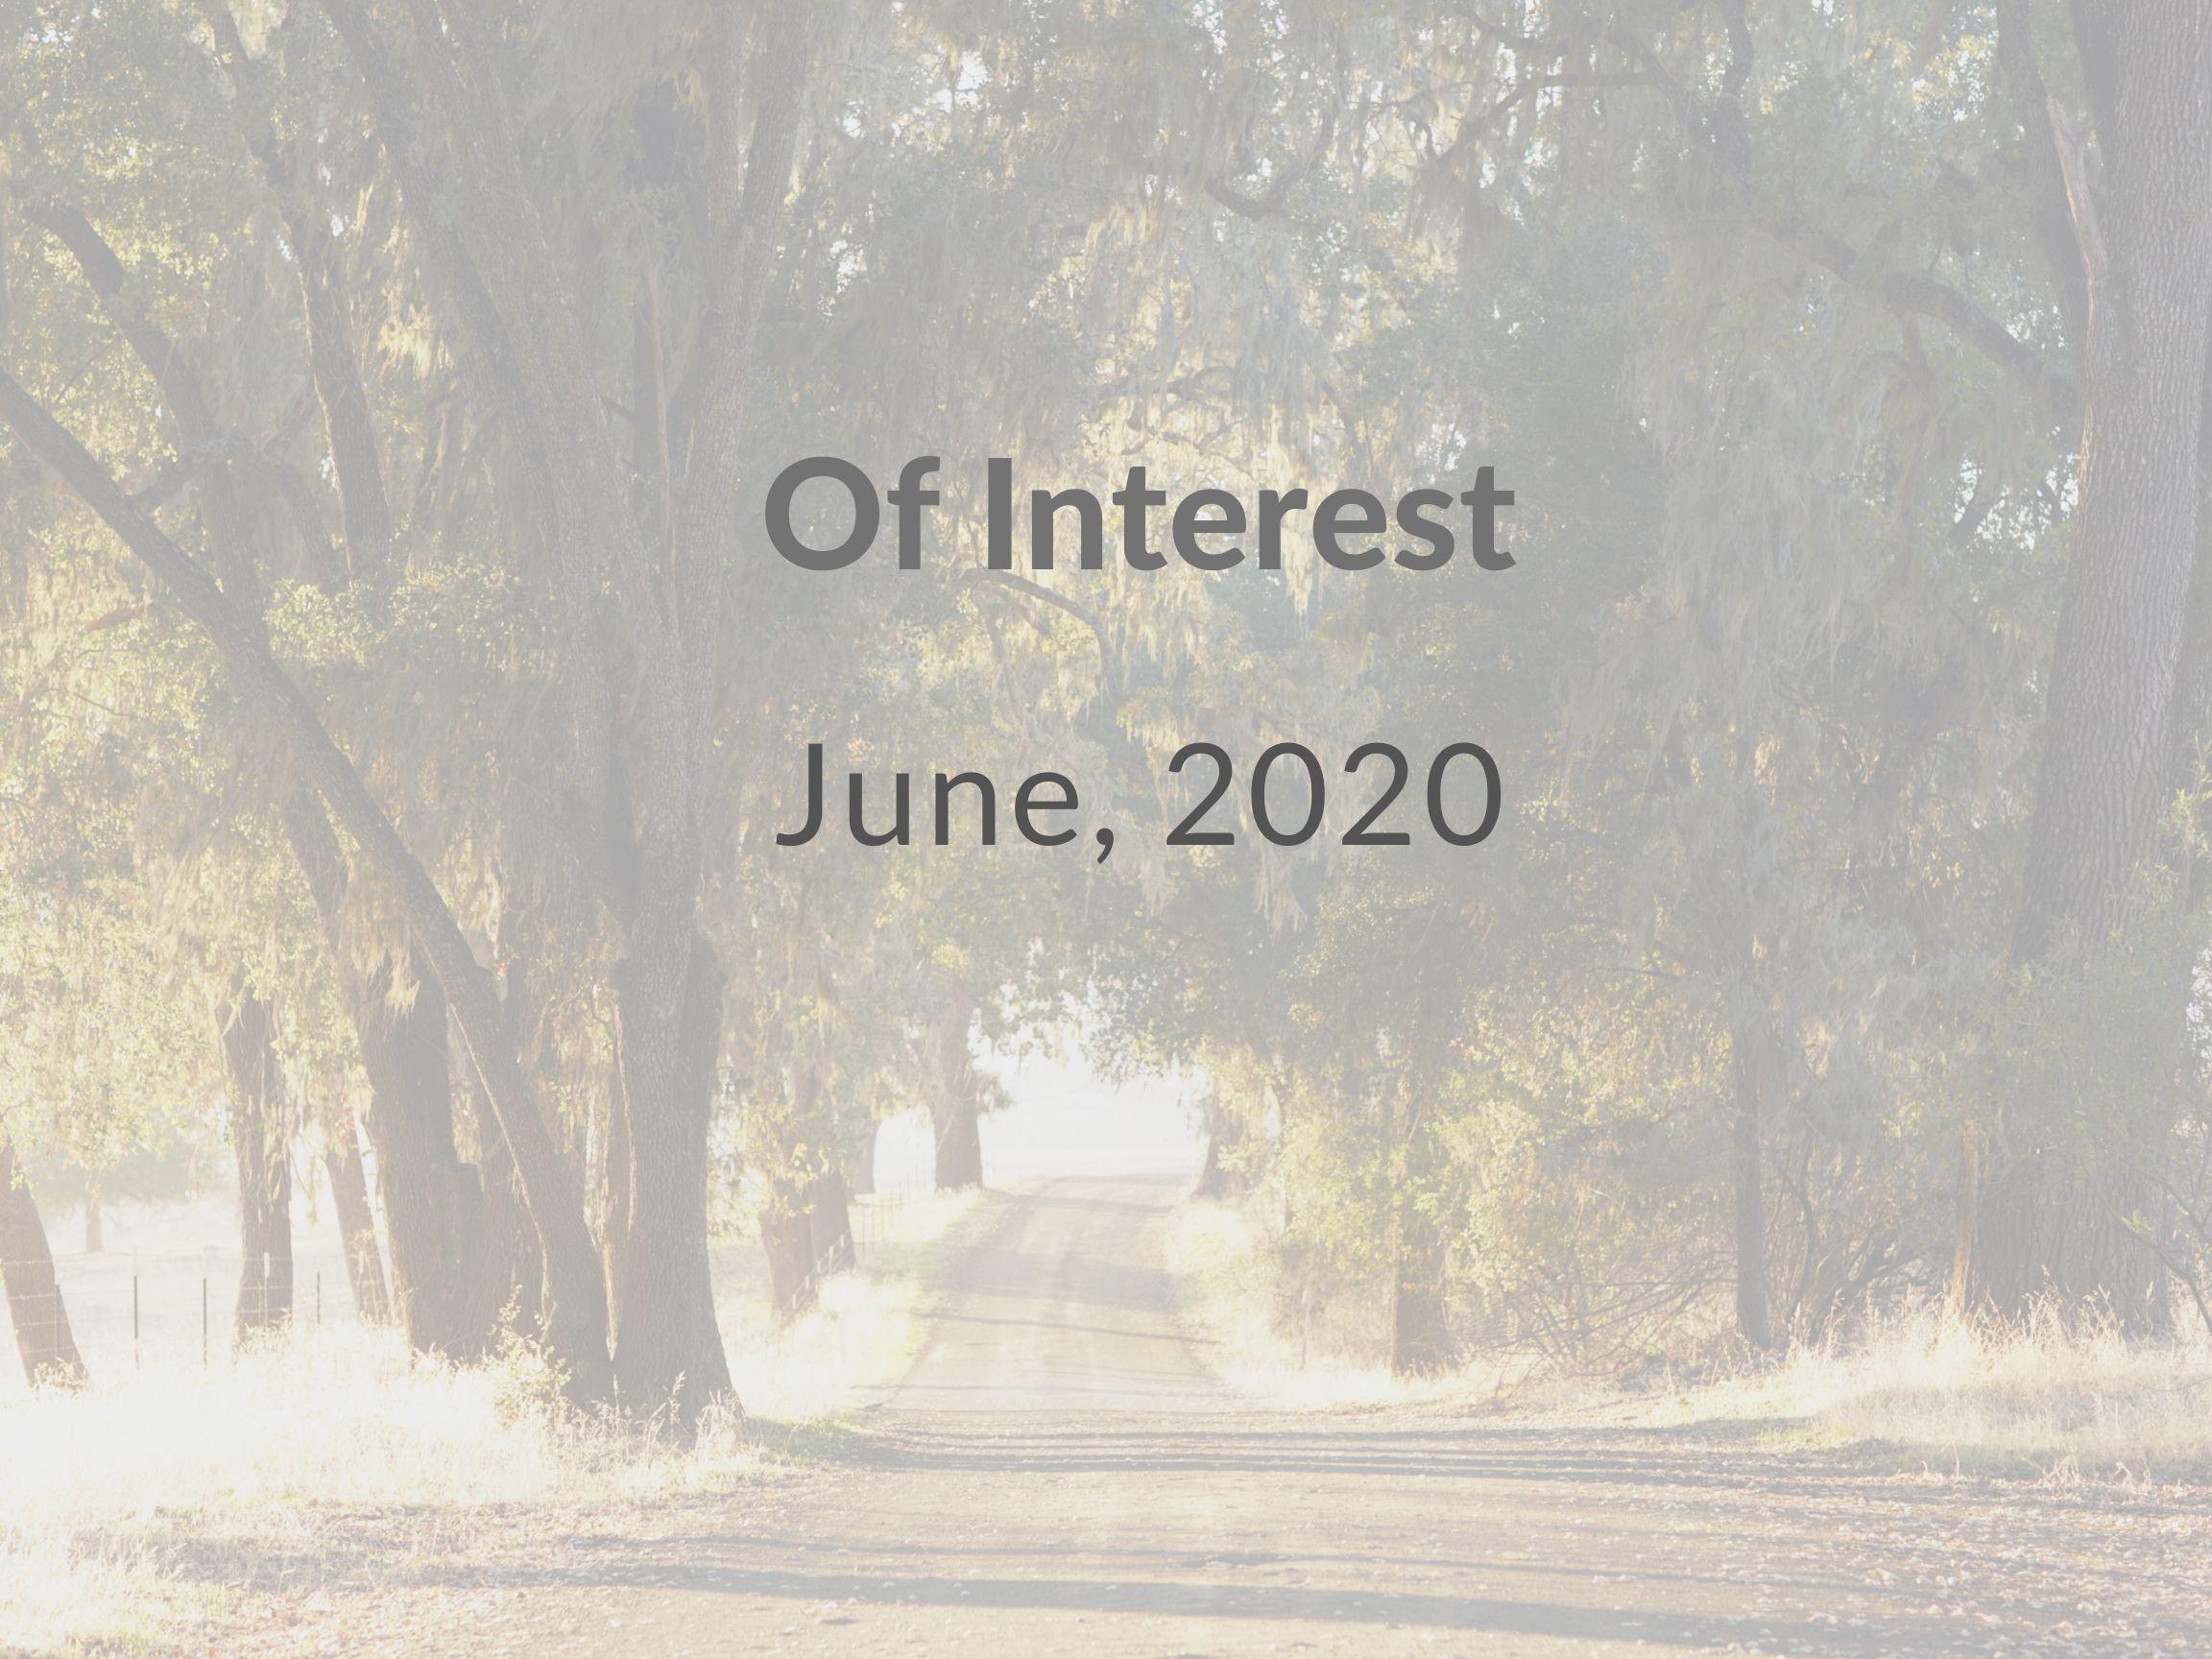 Of Interest, June 2020 Thumbnail